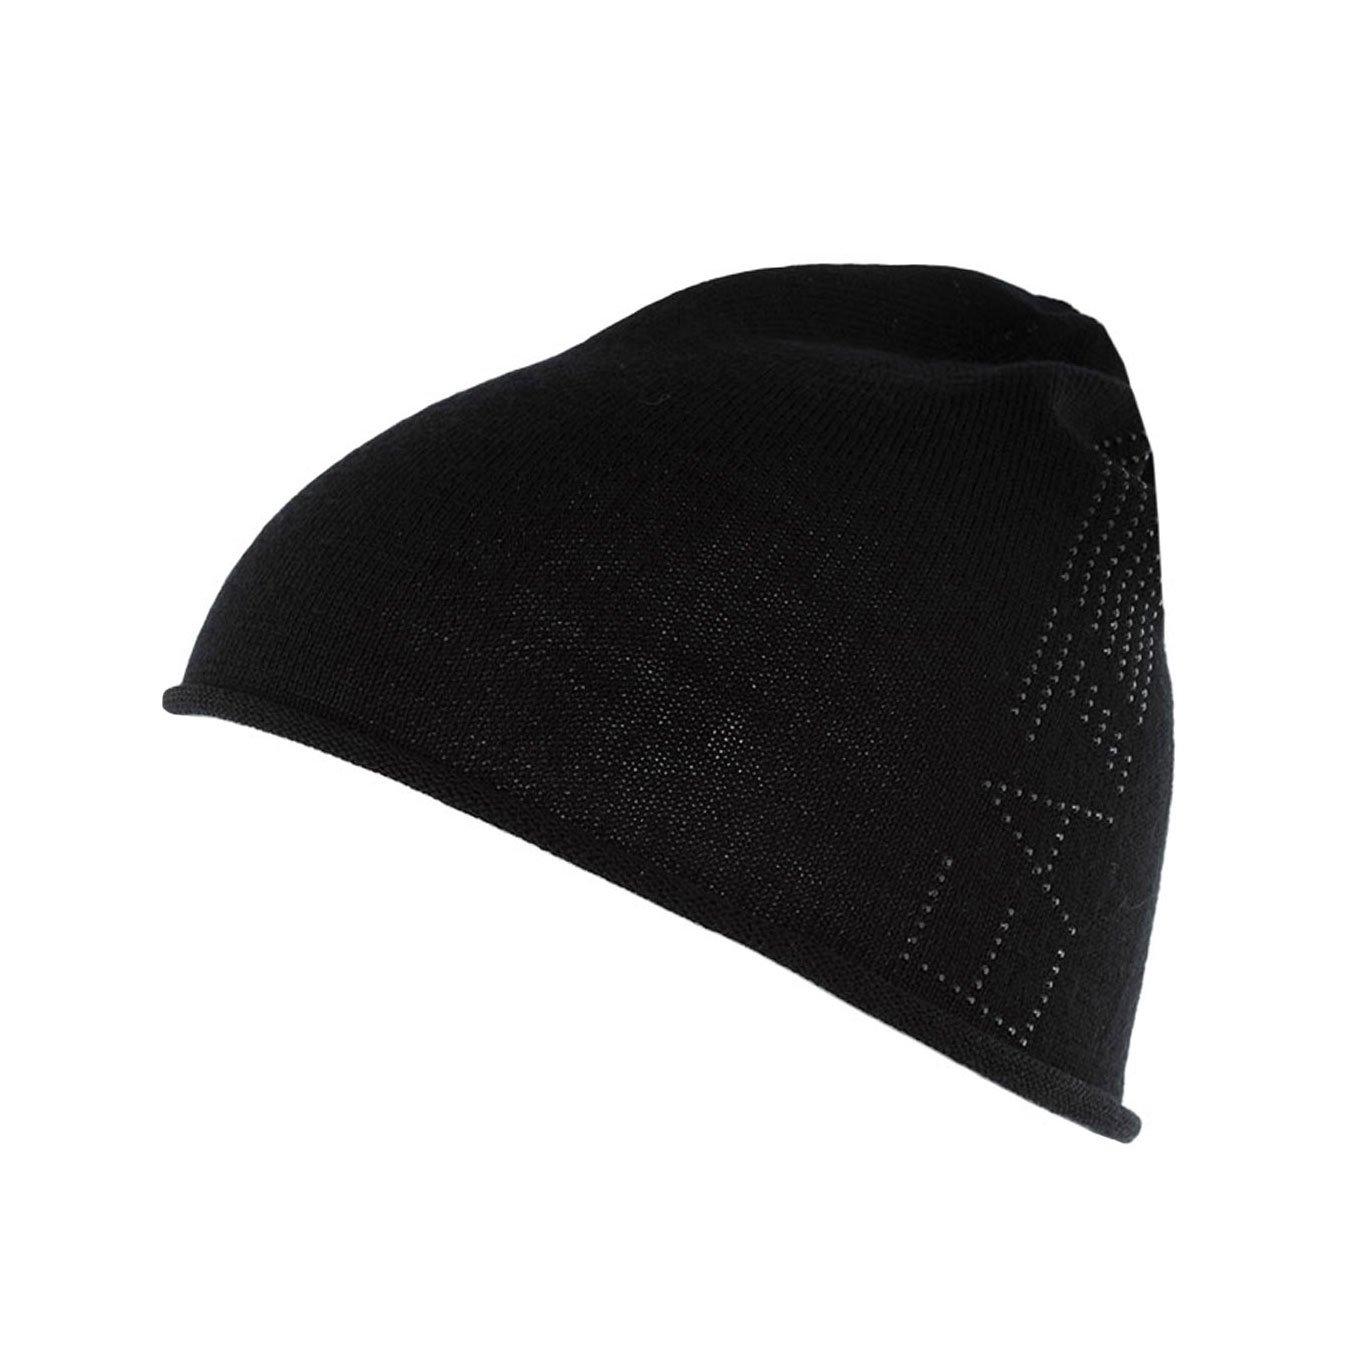 27a18d8243c WOMEN S EMPORIO ARMANI EA7 BEANIE HAT 285385 6A731 00020 BLACK   Amazon.co.uk  Clothing